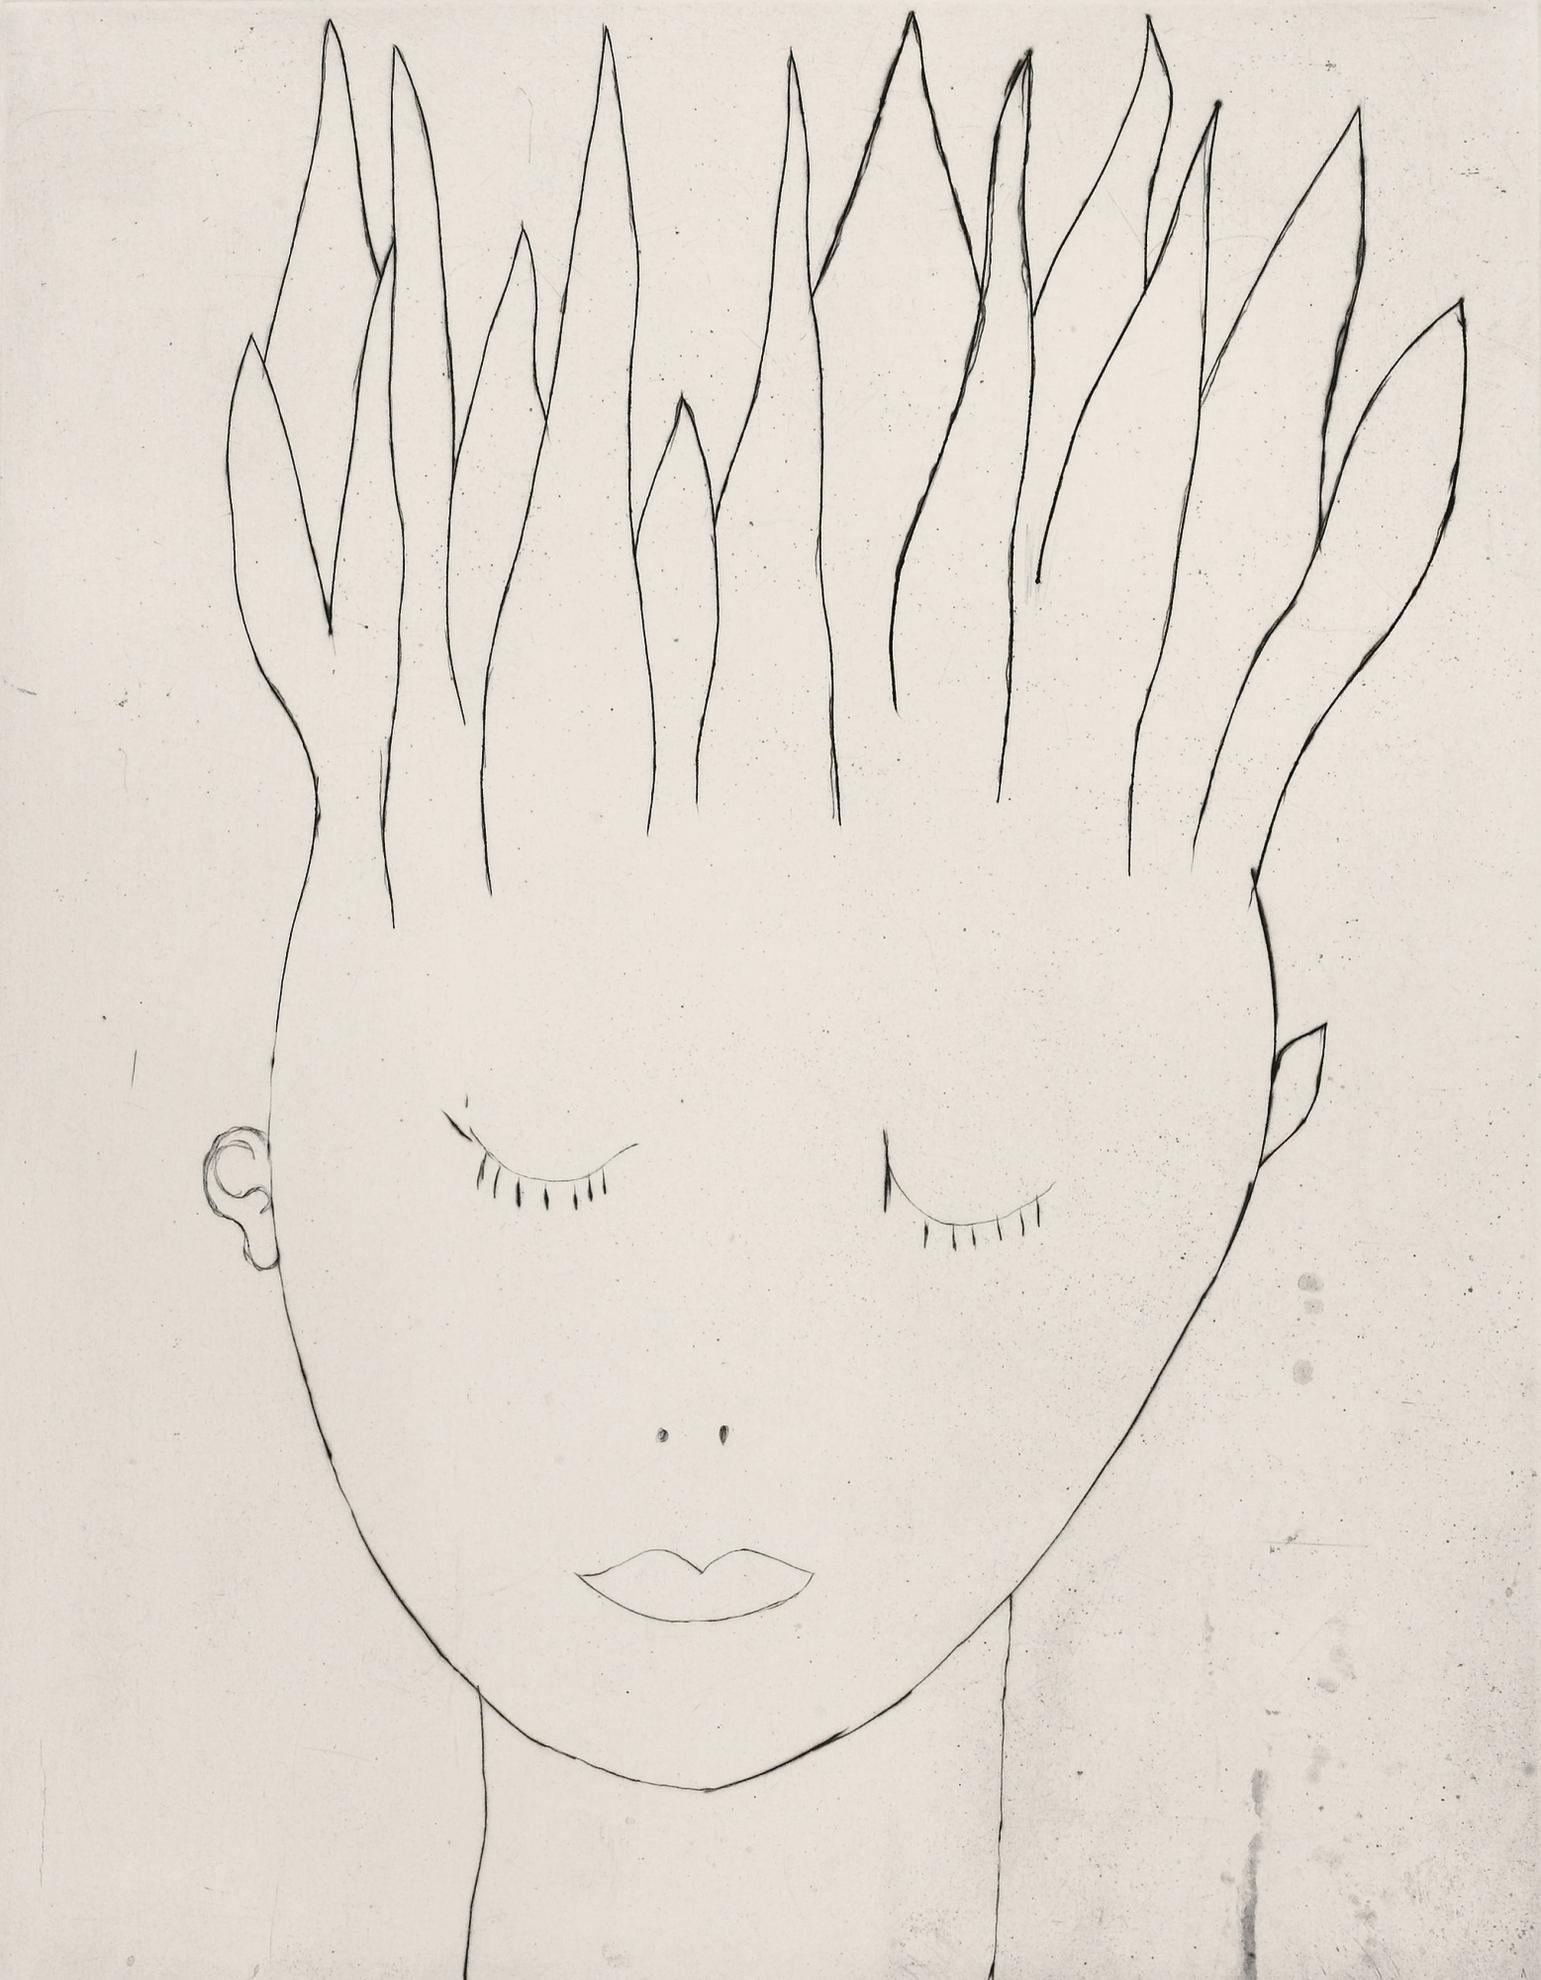 Louise Bourgeois-Head On Fire-2000